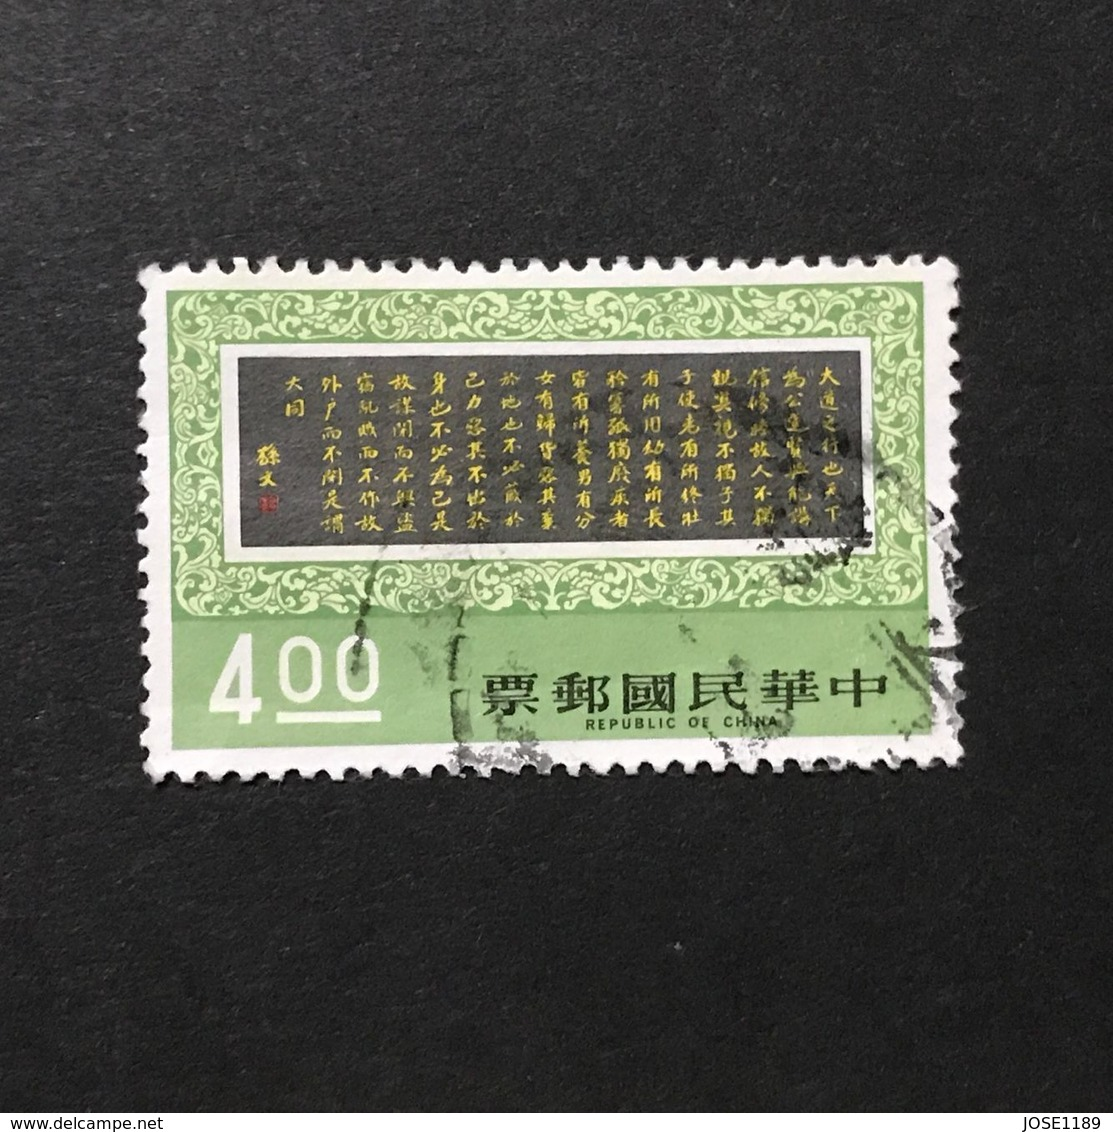 ◆◆◆Taiwán (Formosa)  1975   Dr. Sun Yat-sen (1866-1925), Statesman And Revolutionary Leader.    $4   USED   AA2319 - 1945-... República De China